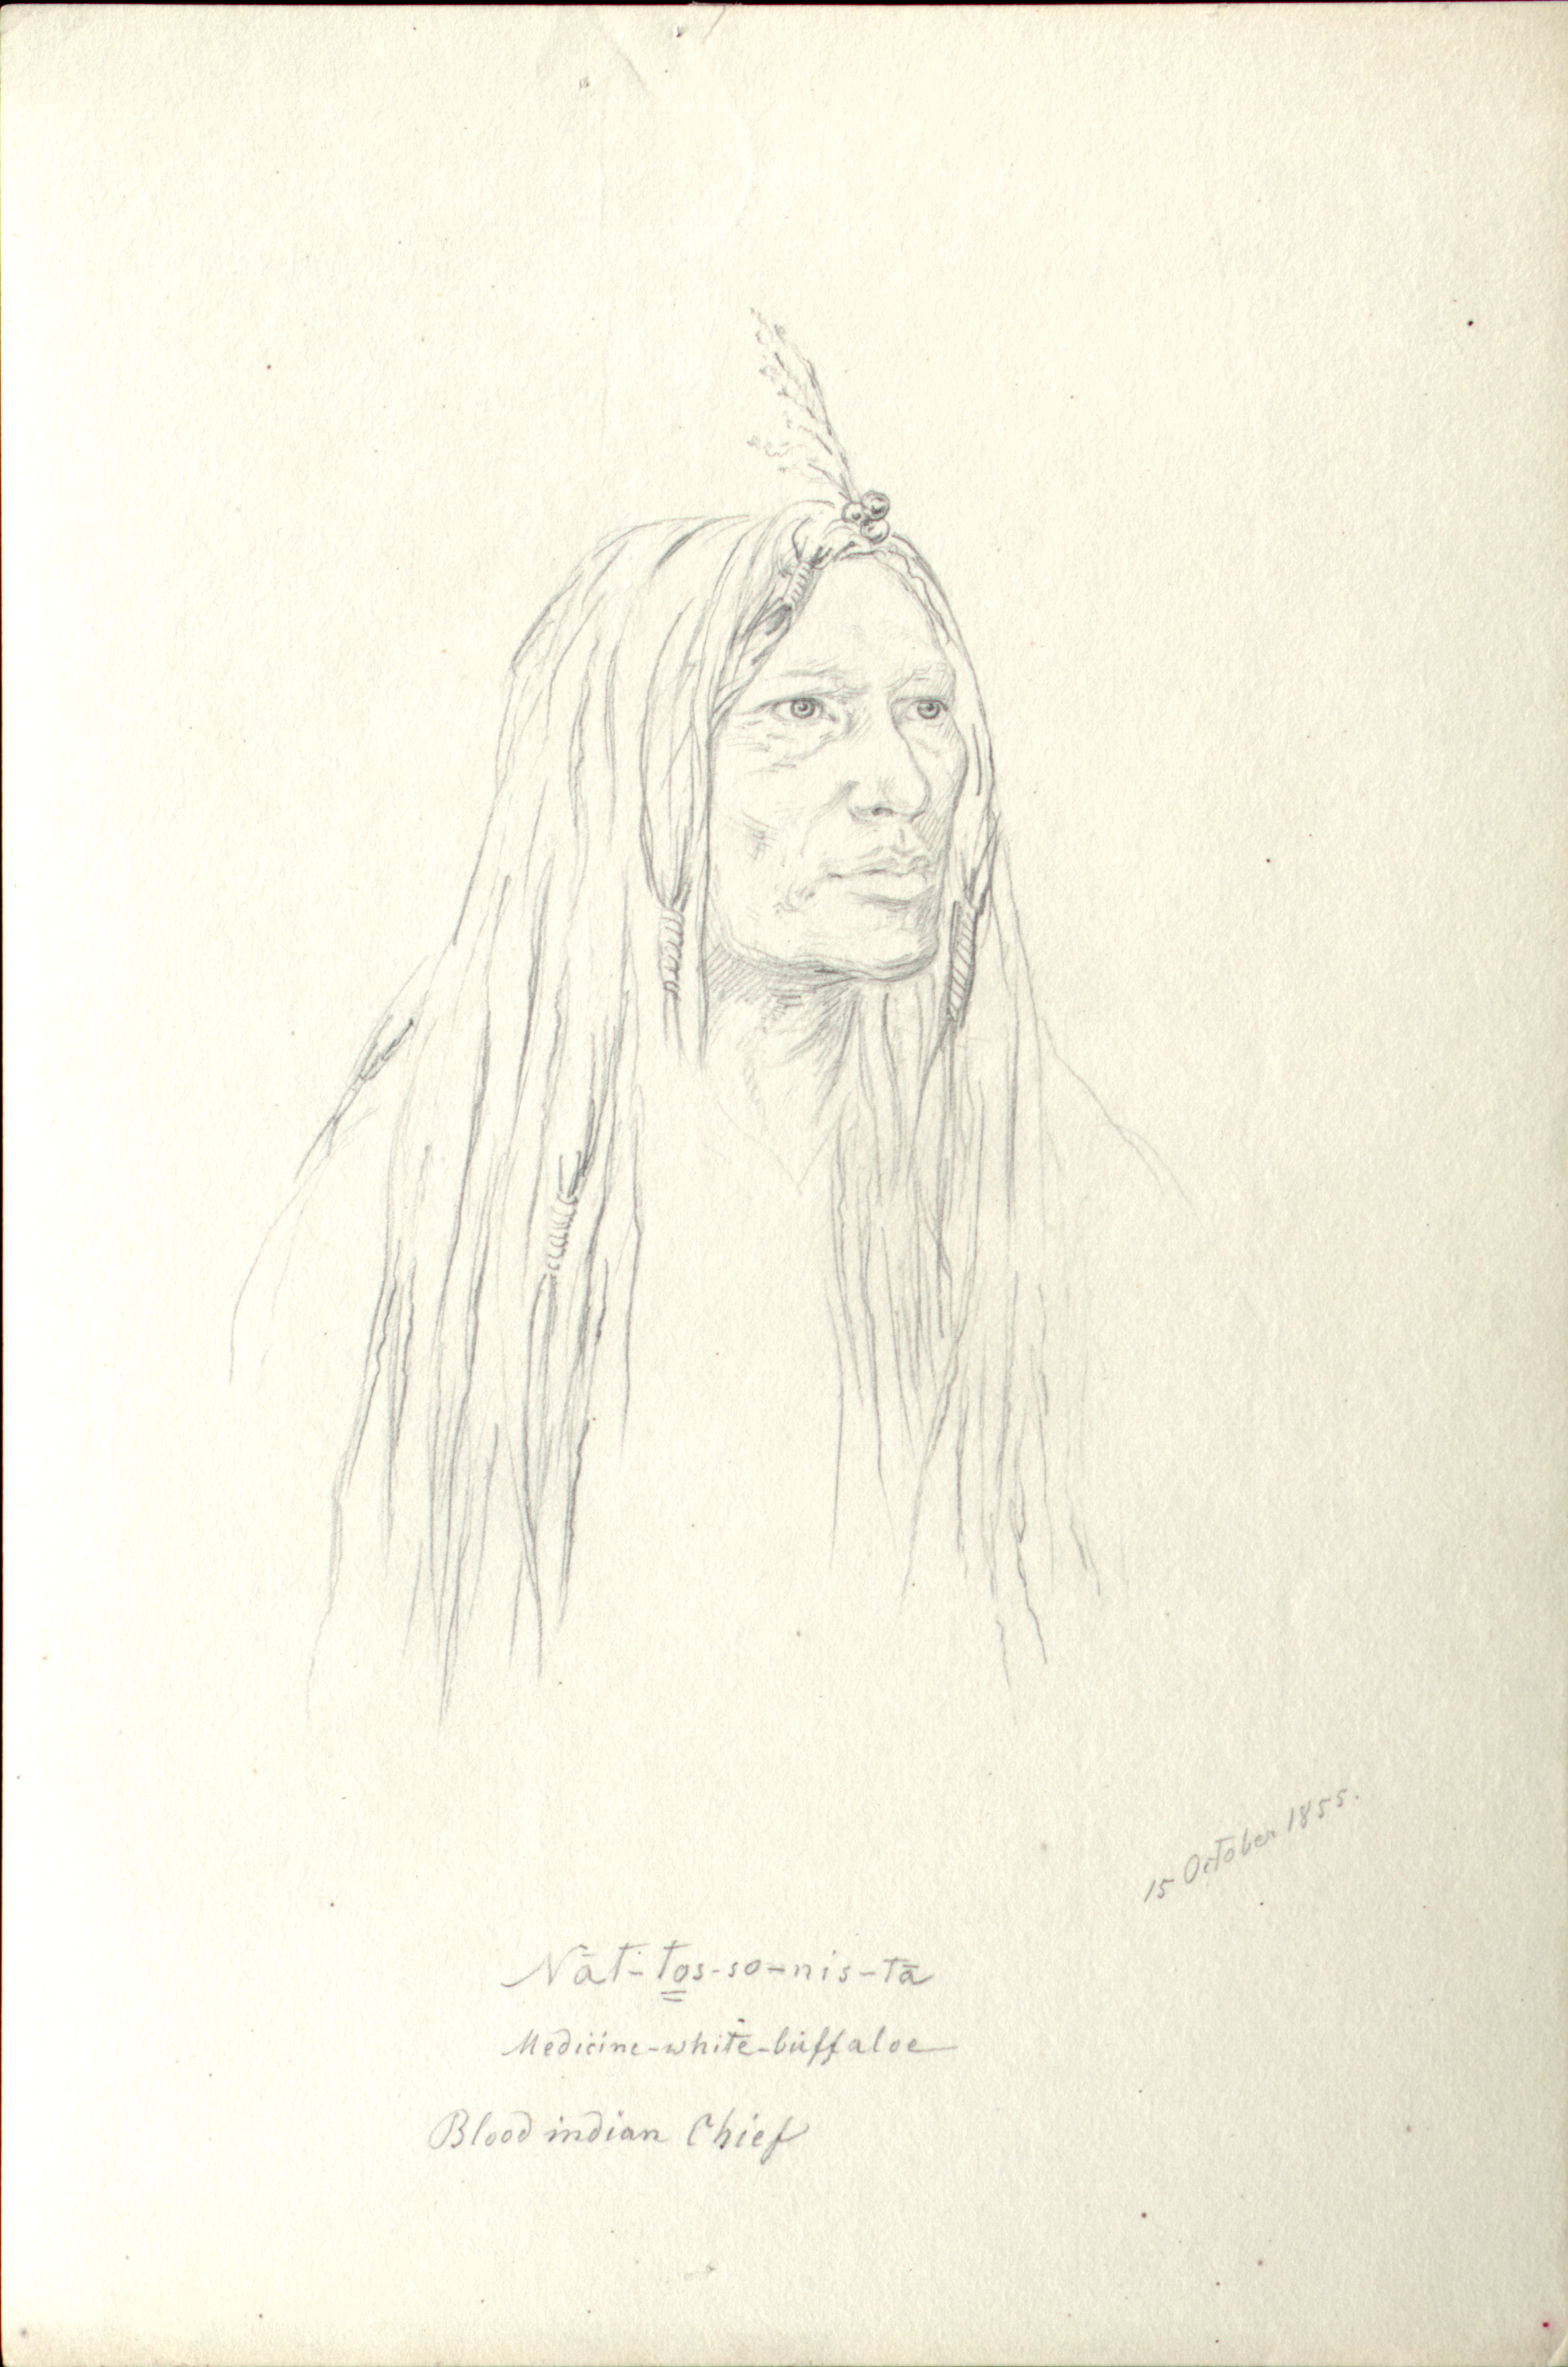 Nat-tos-so-nis-ta  Medicine-white-buffaloe  Blood Indian Chief